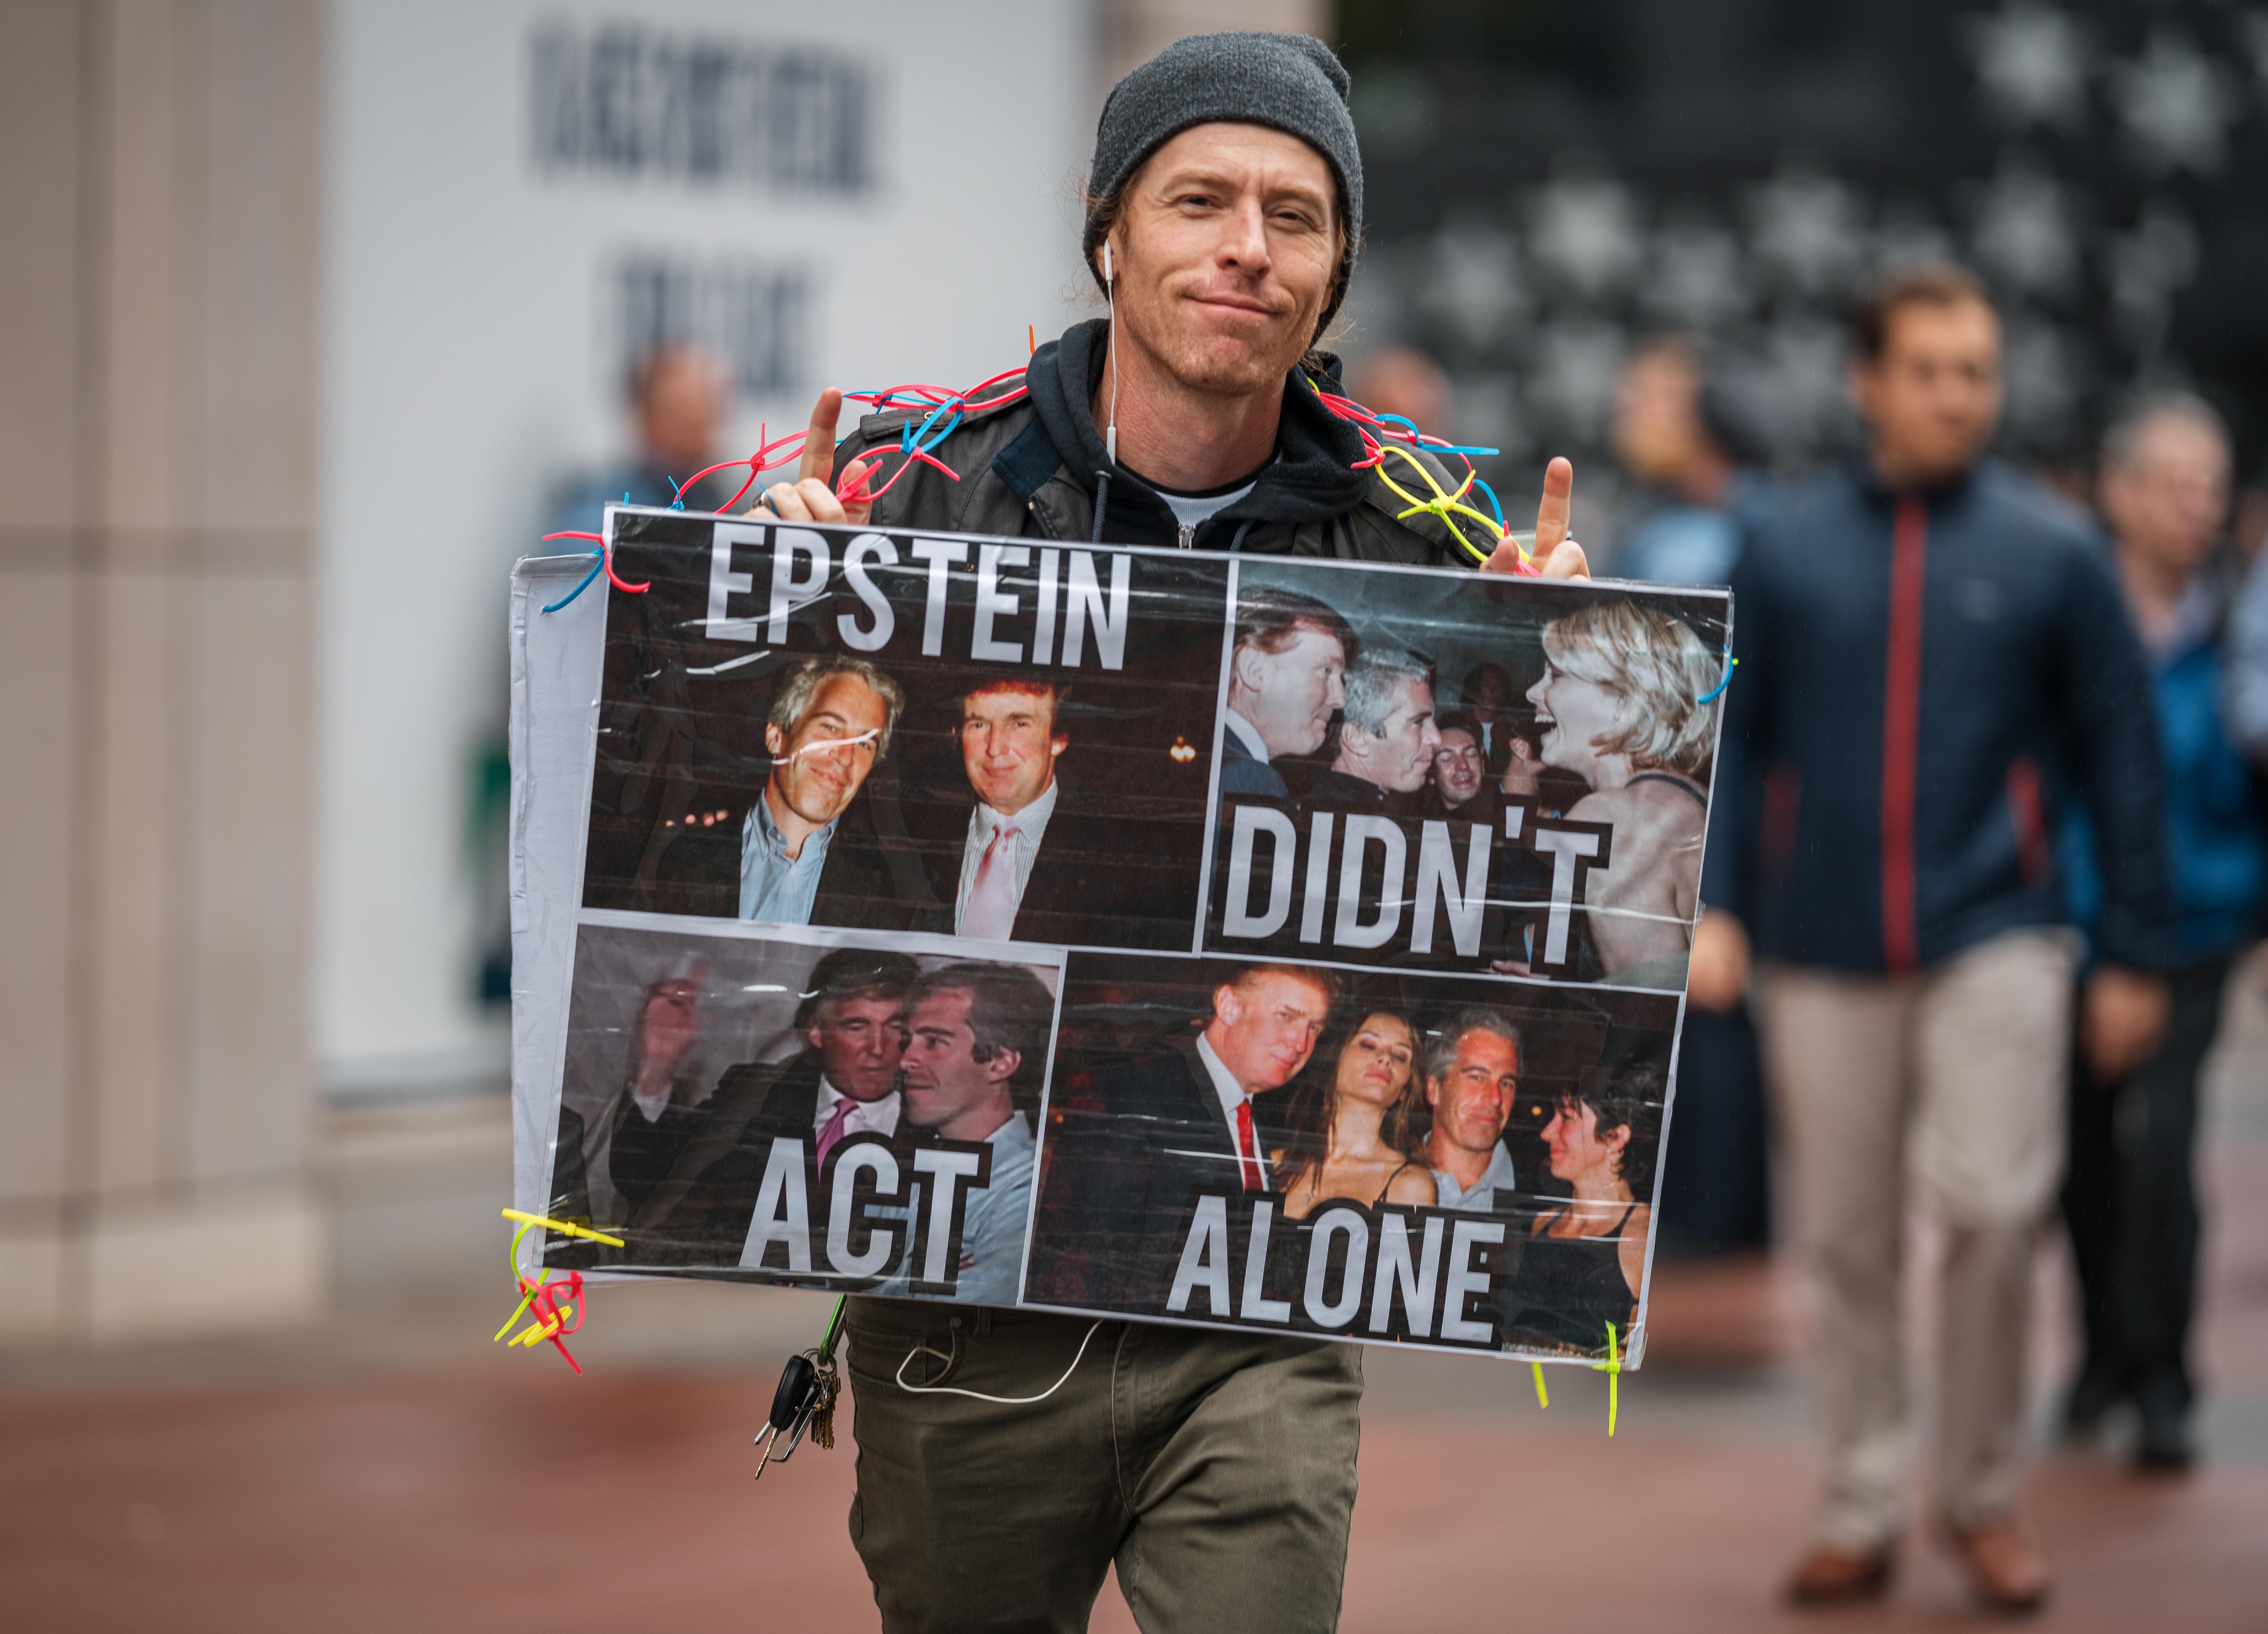 Jeffrey Epstein Protestor